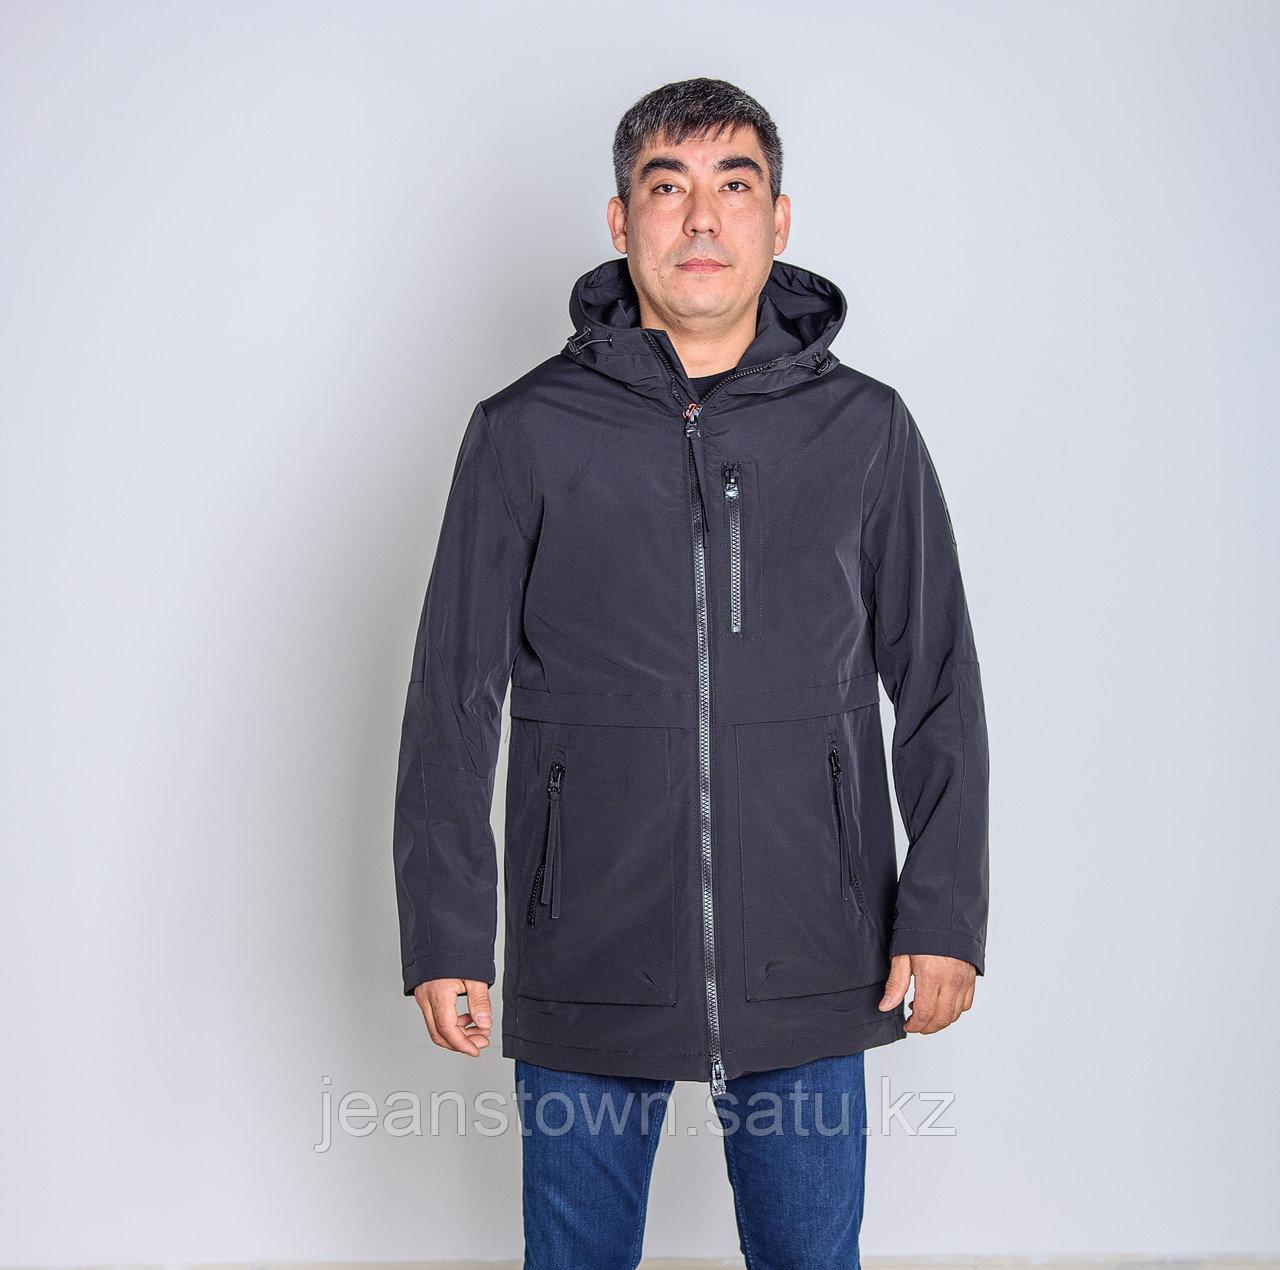 Куртка мужская демисезонная Kings Wind черная - фото 1